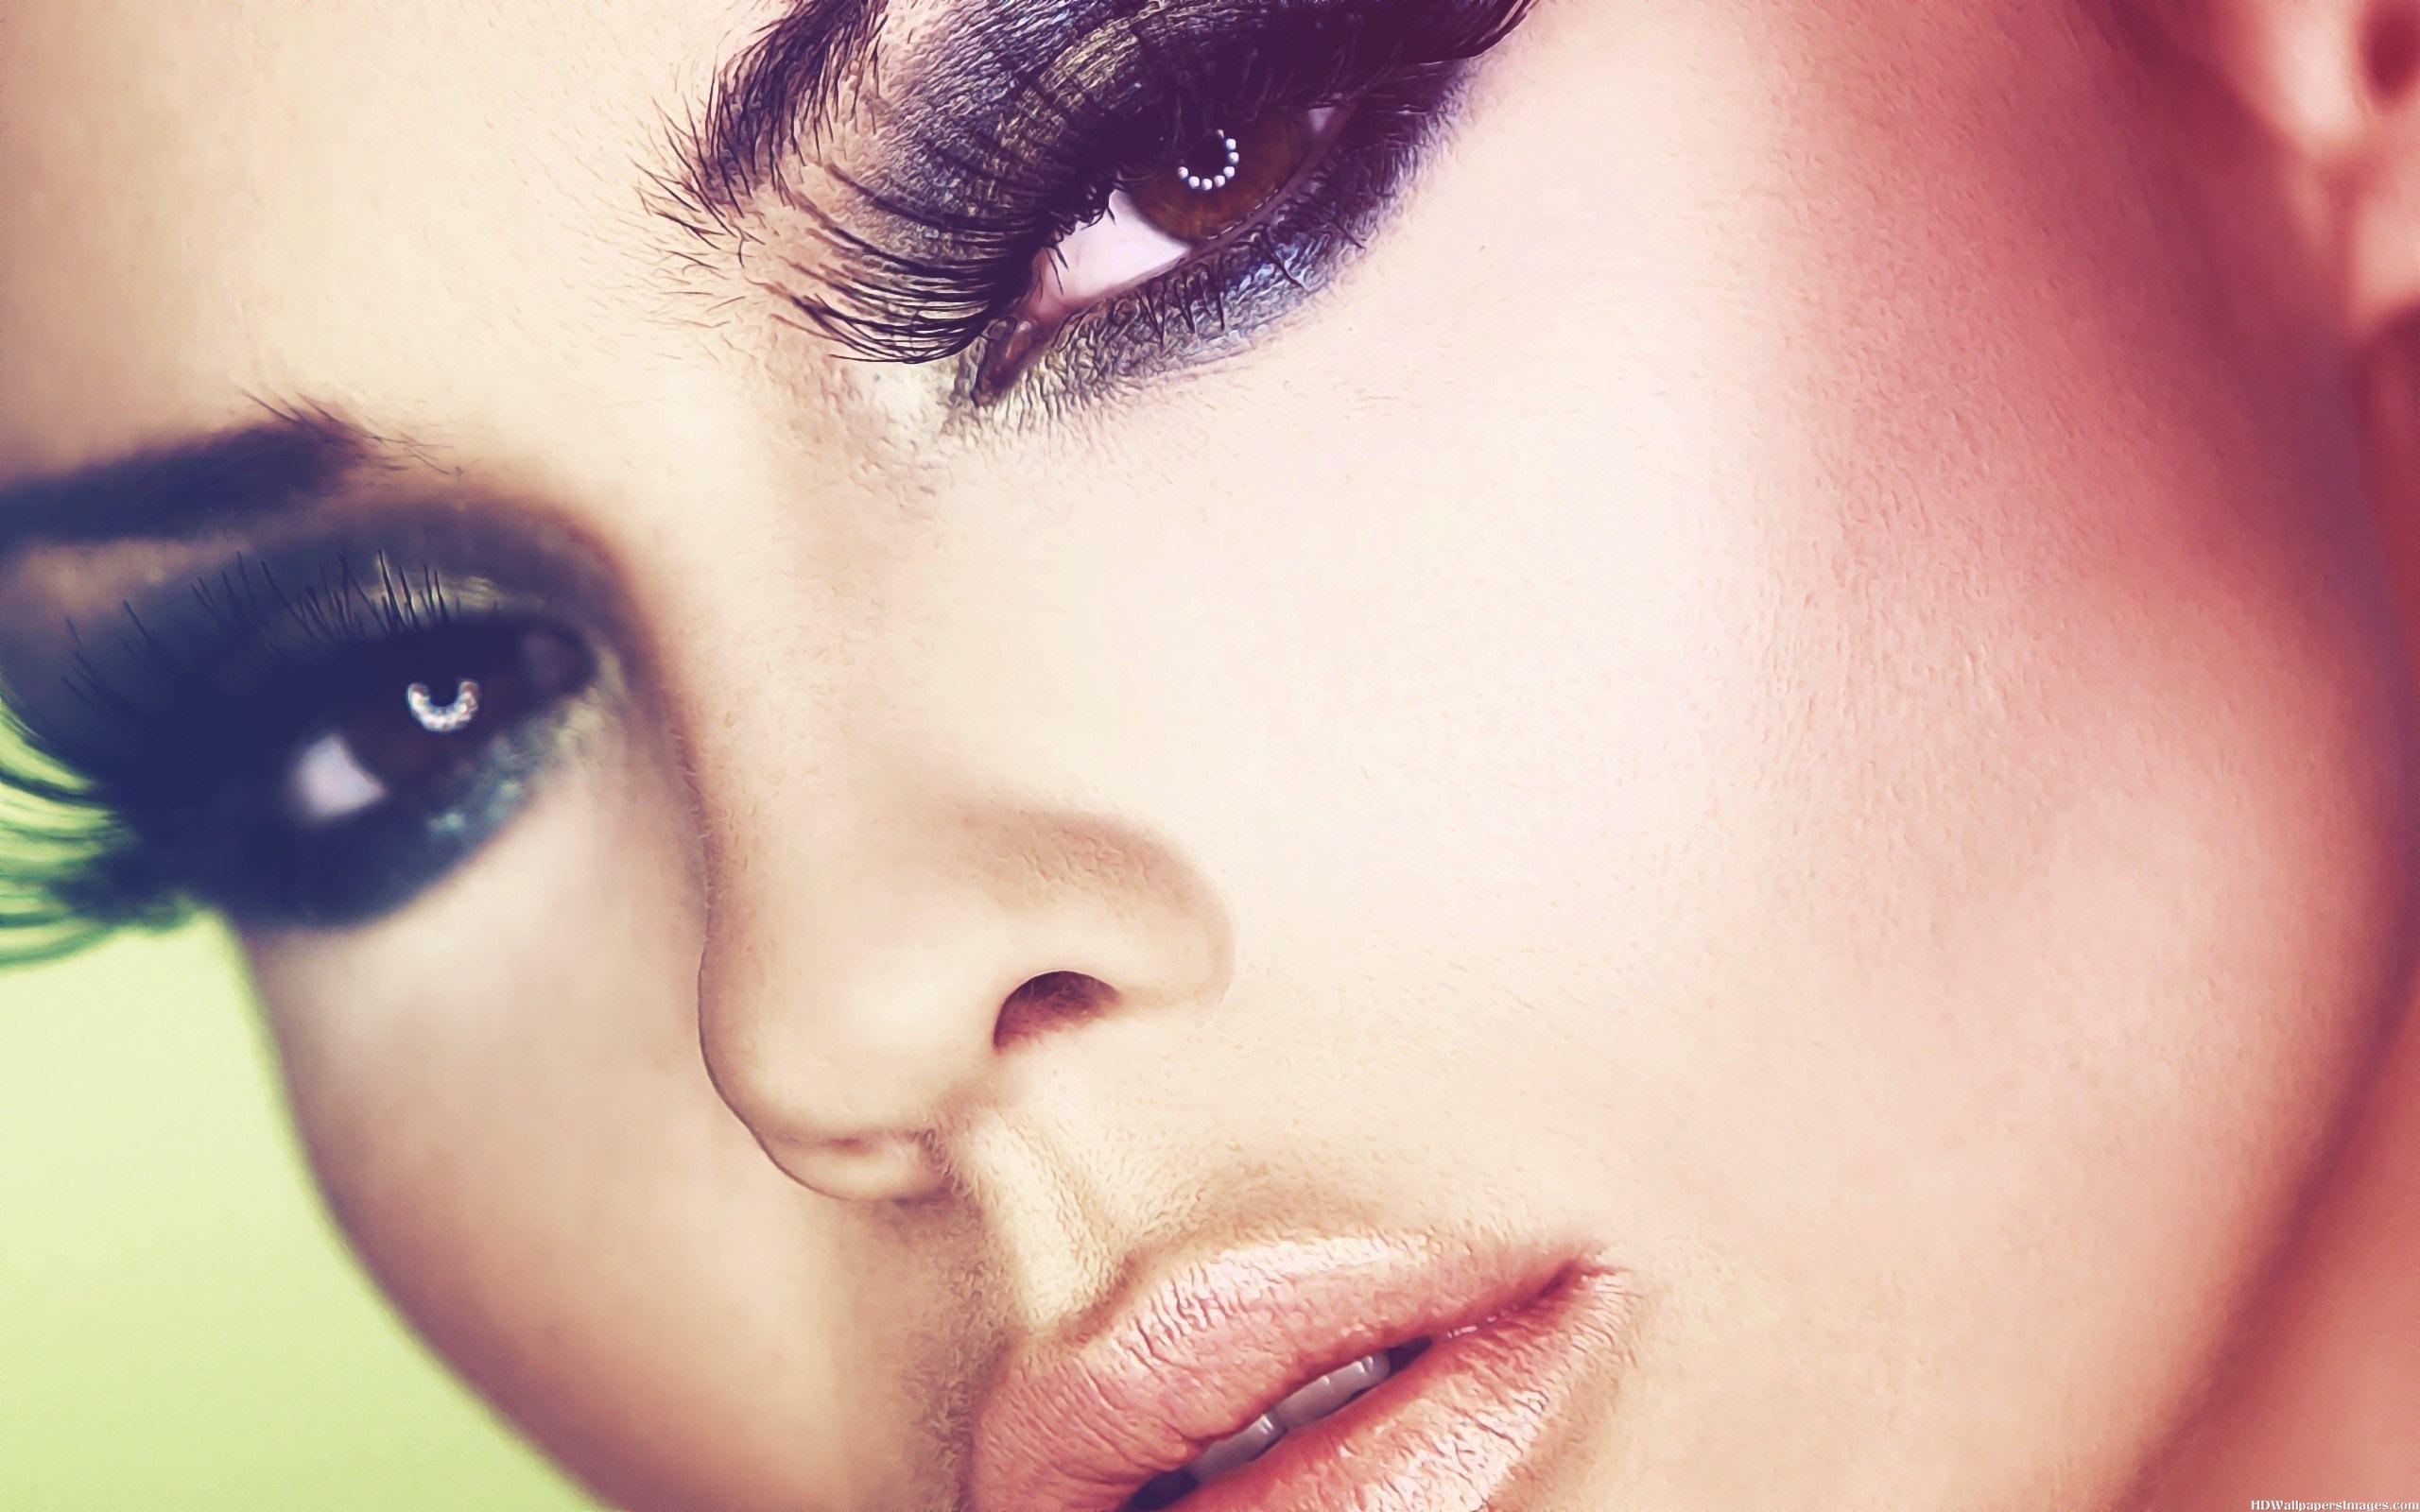 girls_eye_makeup_hd_wallpapers